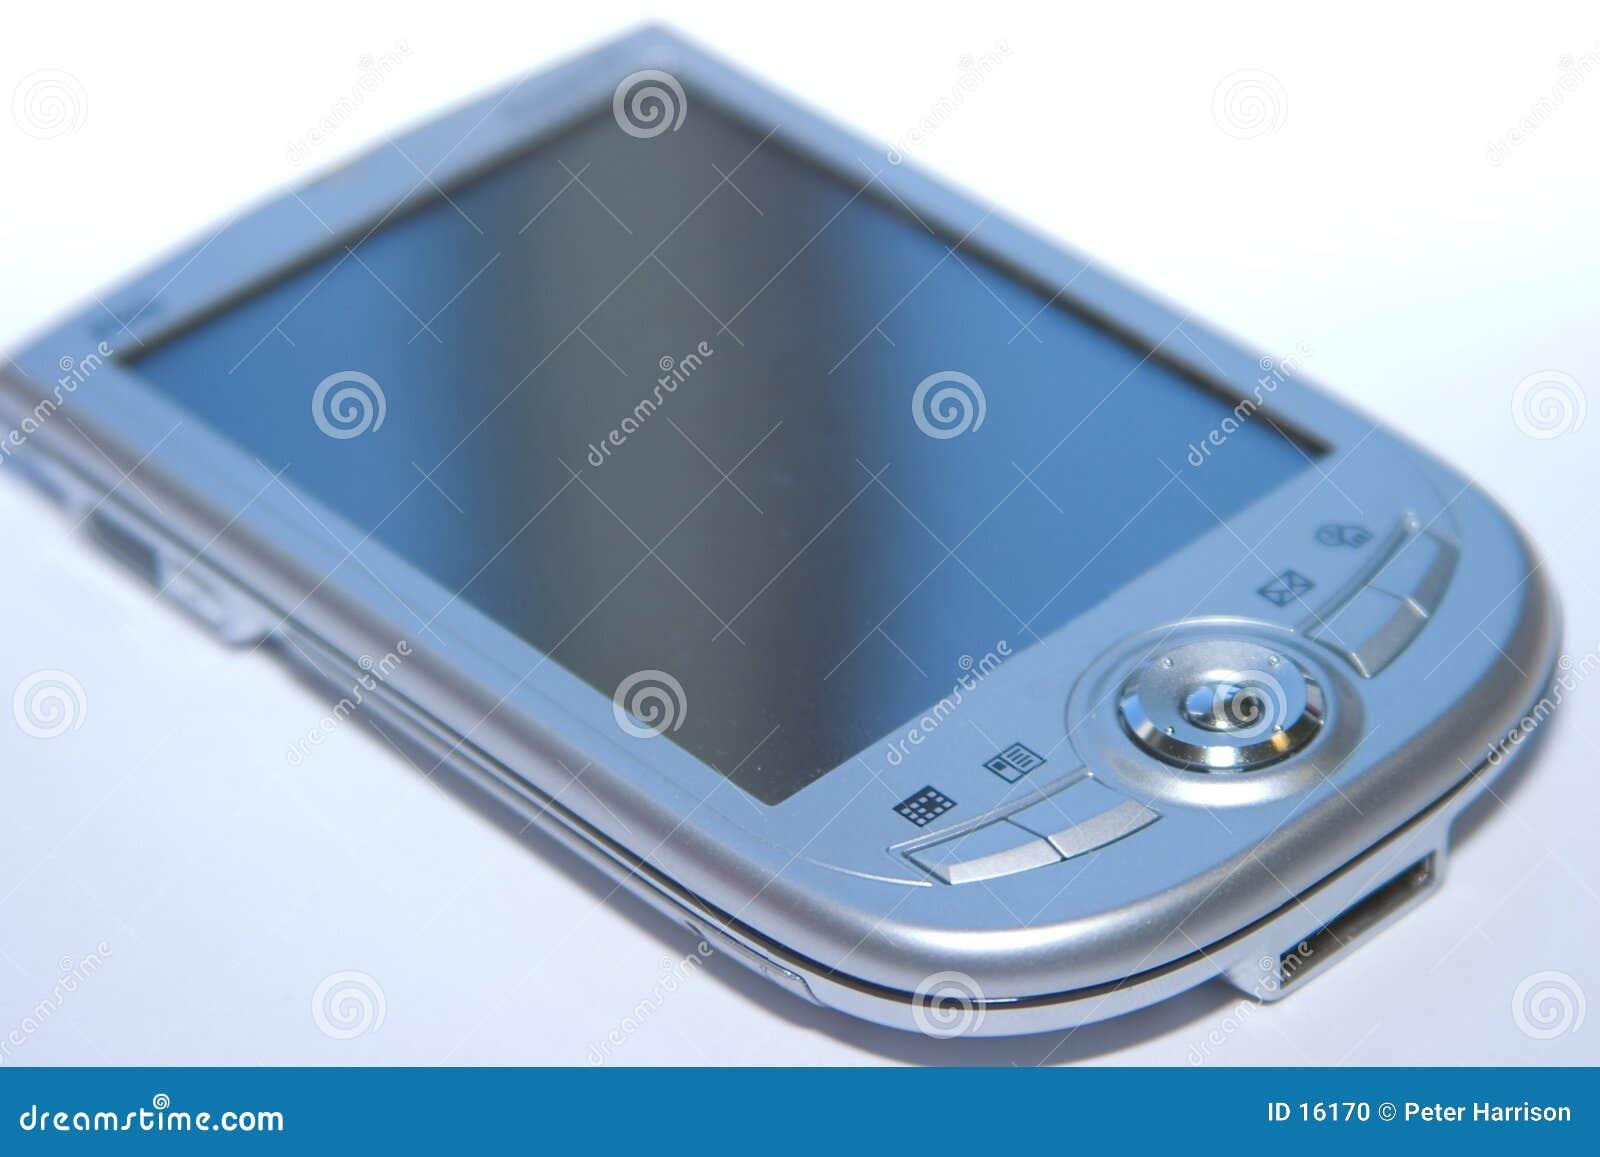 Download Pda 库存照片. 图片 包括有 飞行员, 屏幕, 玻璃, 无线, 显示, 商业, 数字式, 按钮, 进入, sync - 16170